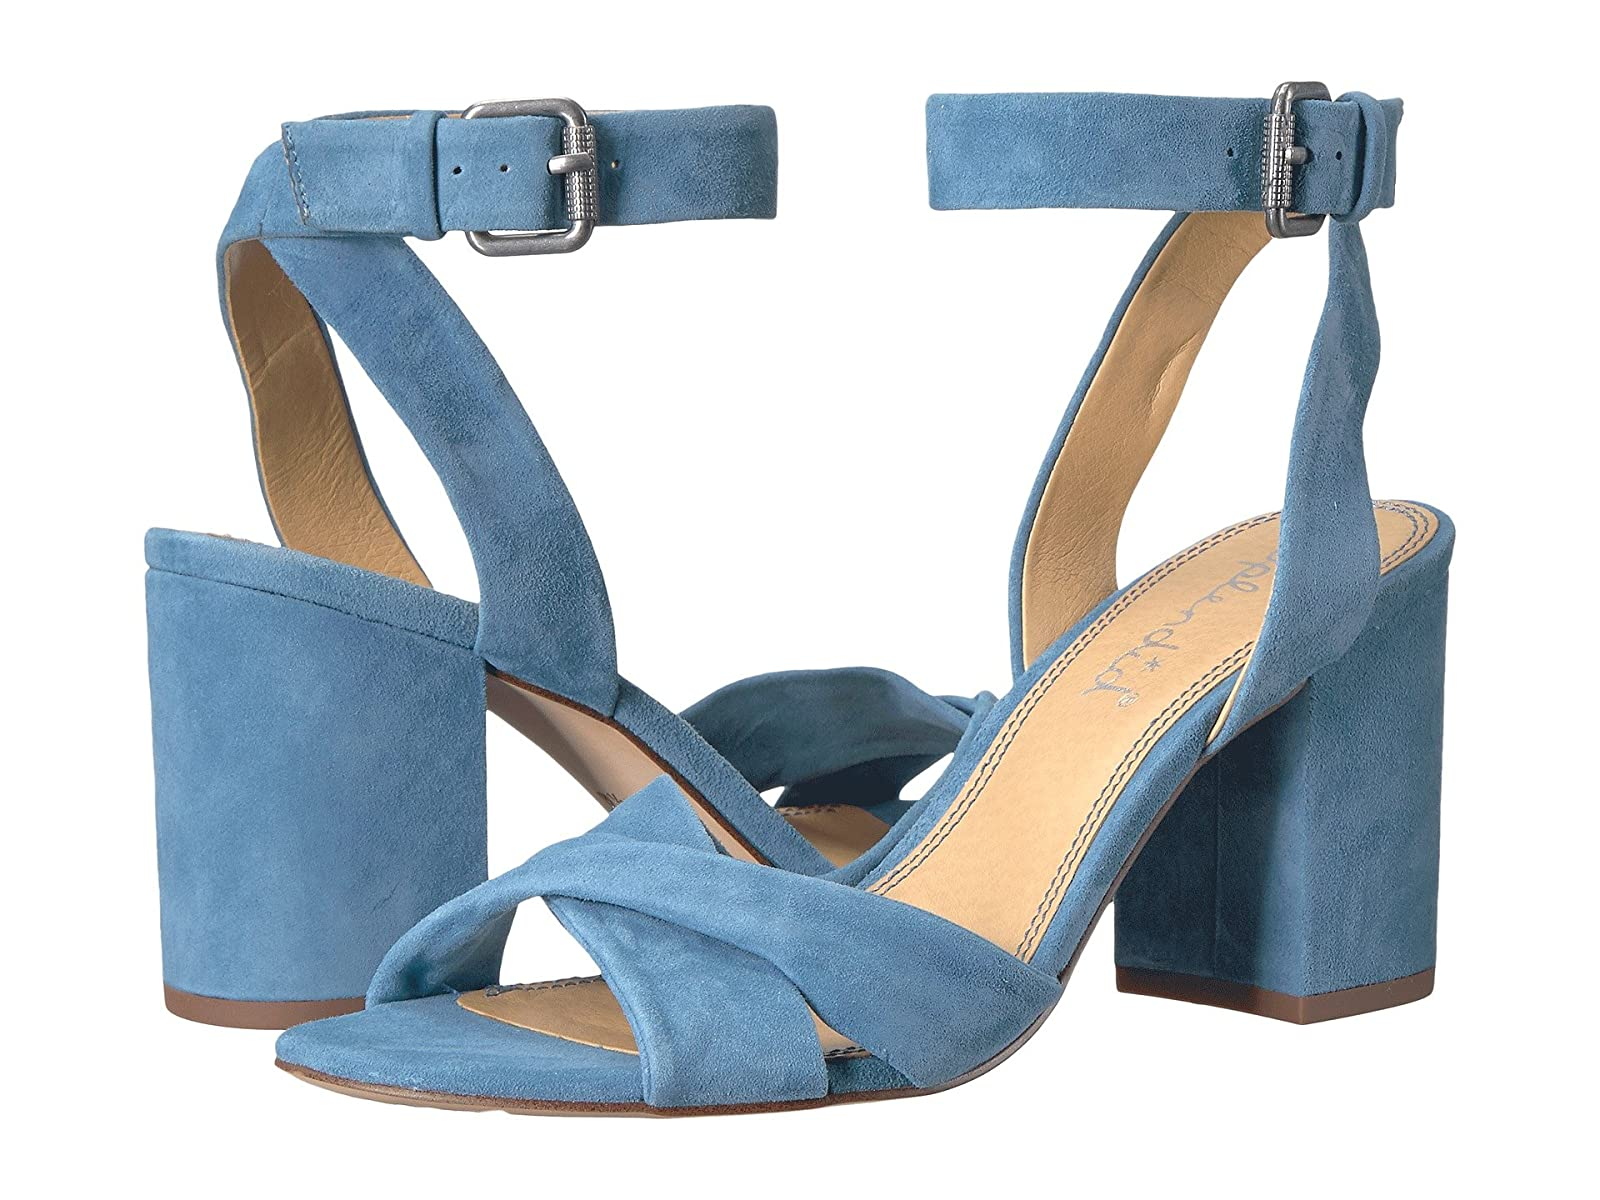 Splendid FairyCheap and distinctive eye-catching shoes